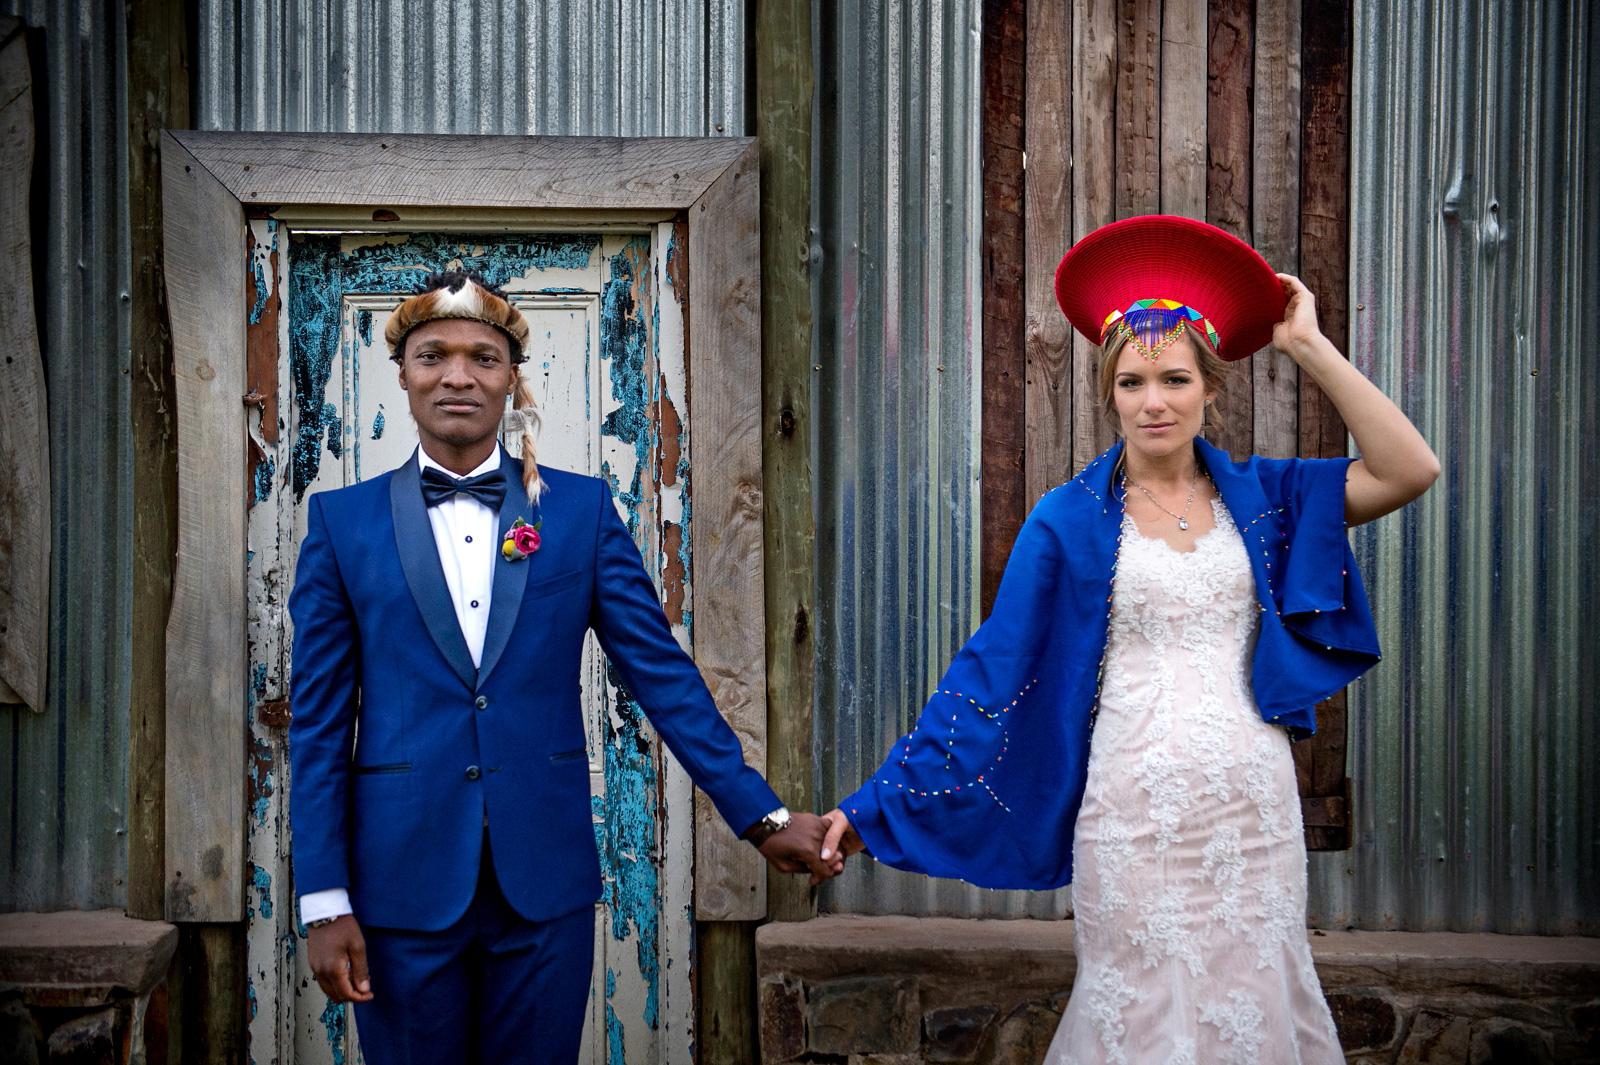 Zulu man weds German lady in South Africa